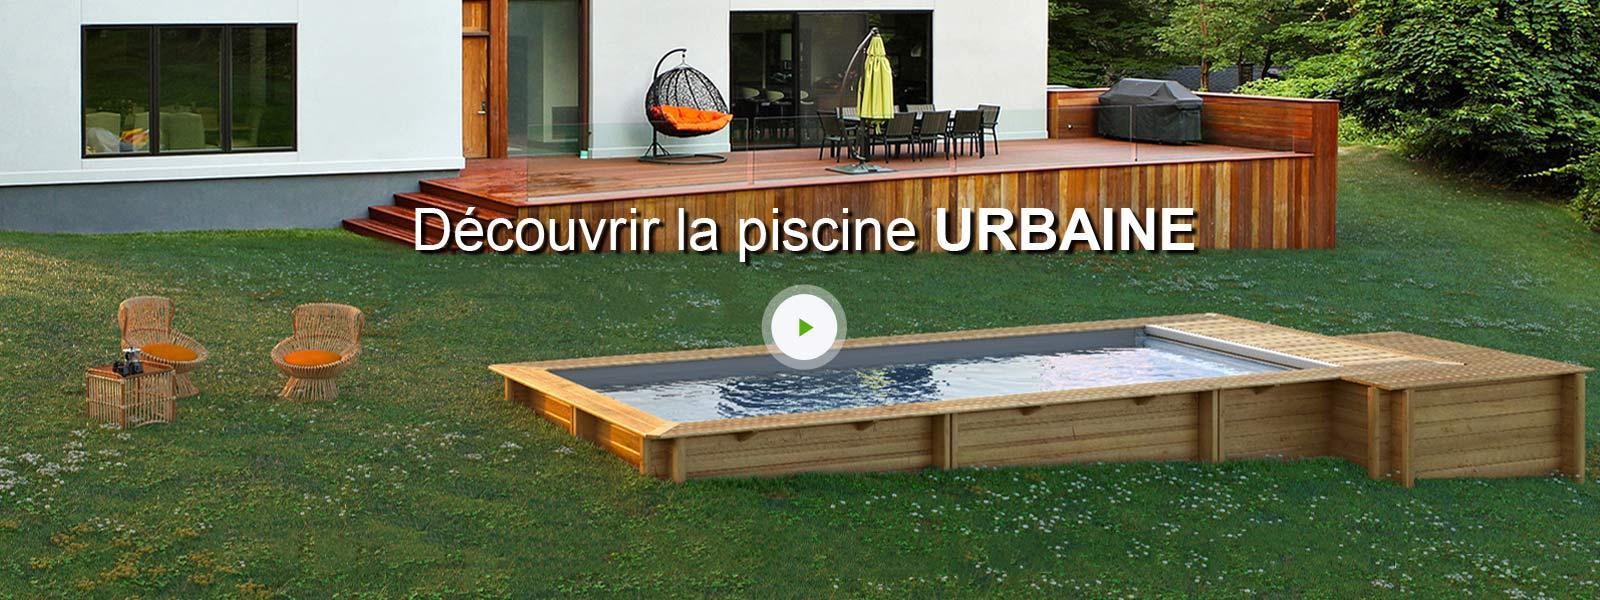 piscine hors sol bois urbaine proswell by procopi l 2 5 x. Black Bedroom Furniture Sets. Home Design Ideas